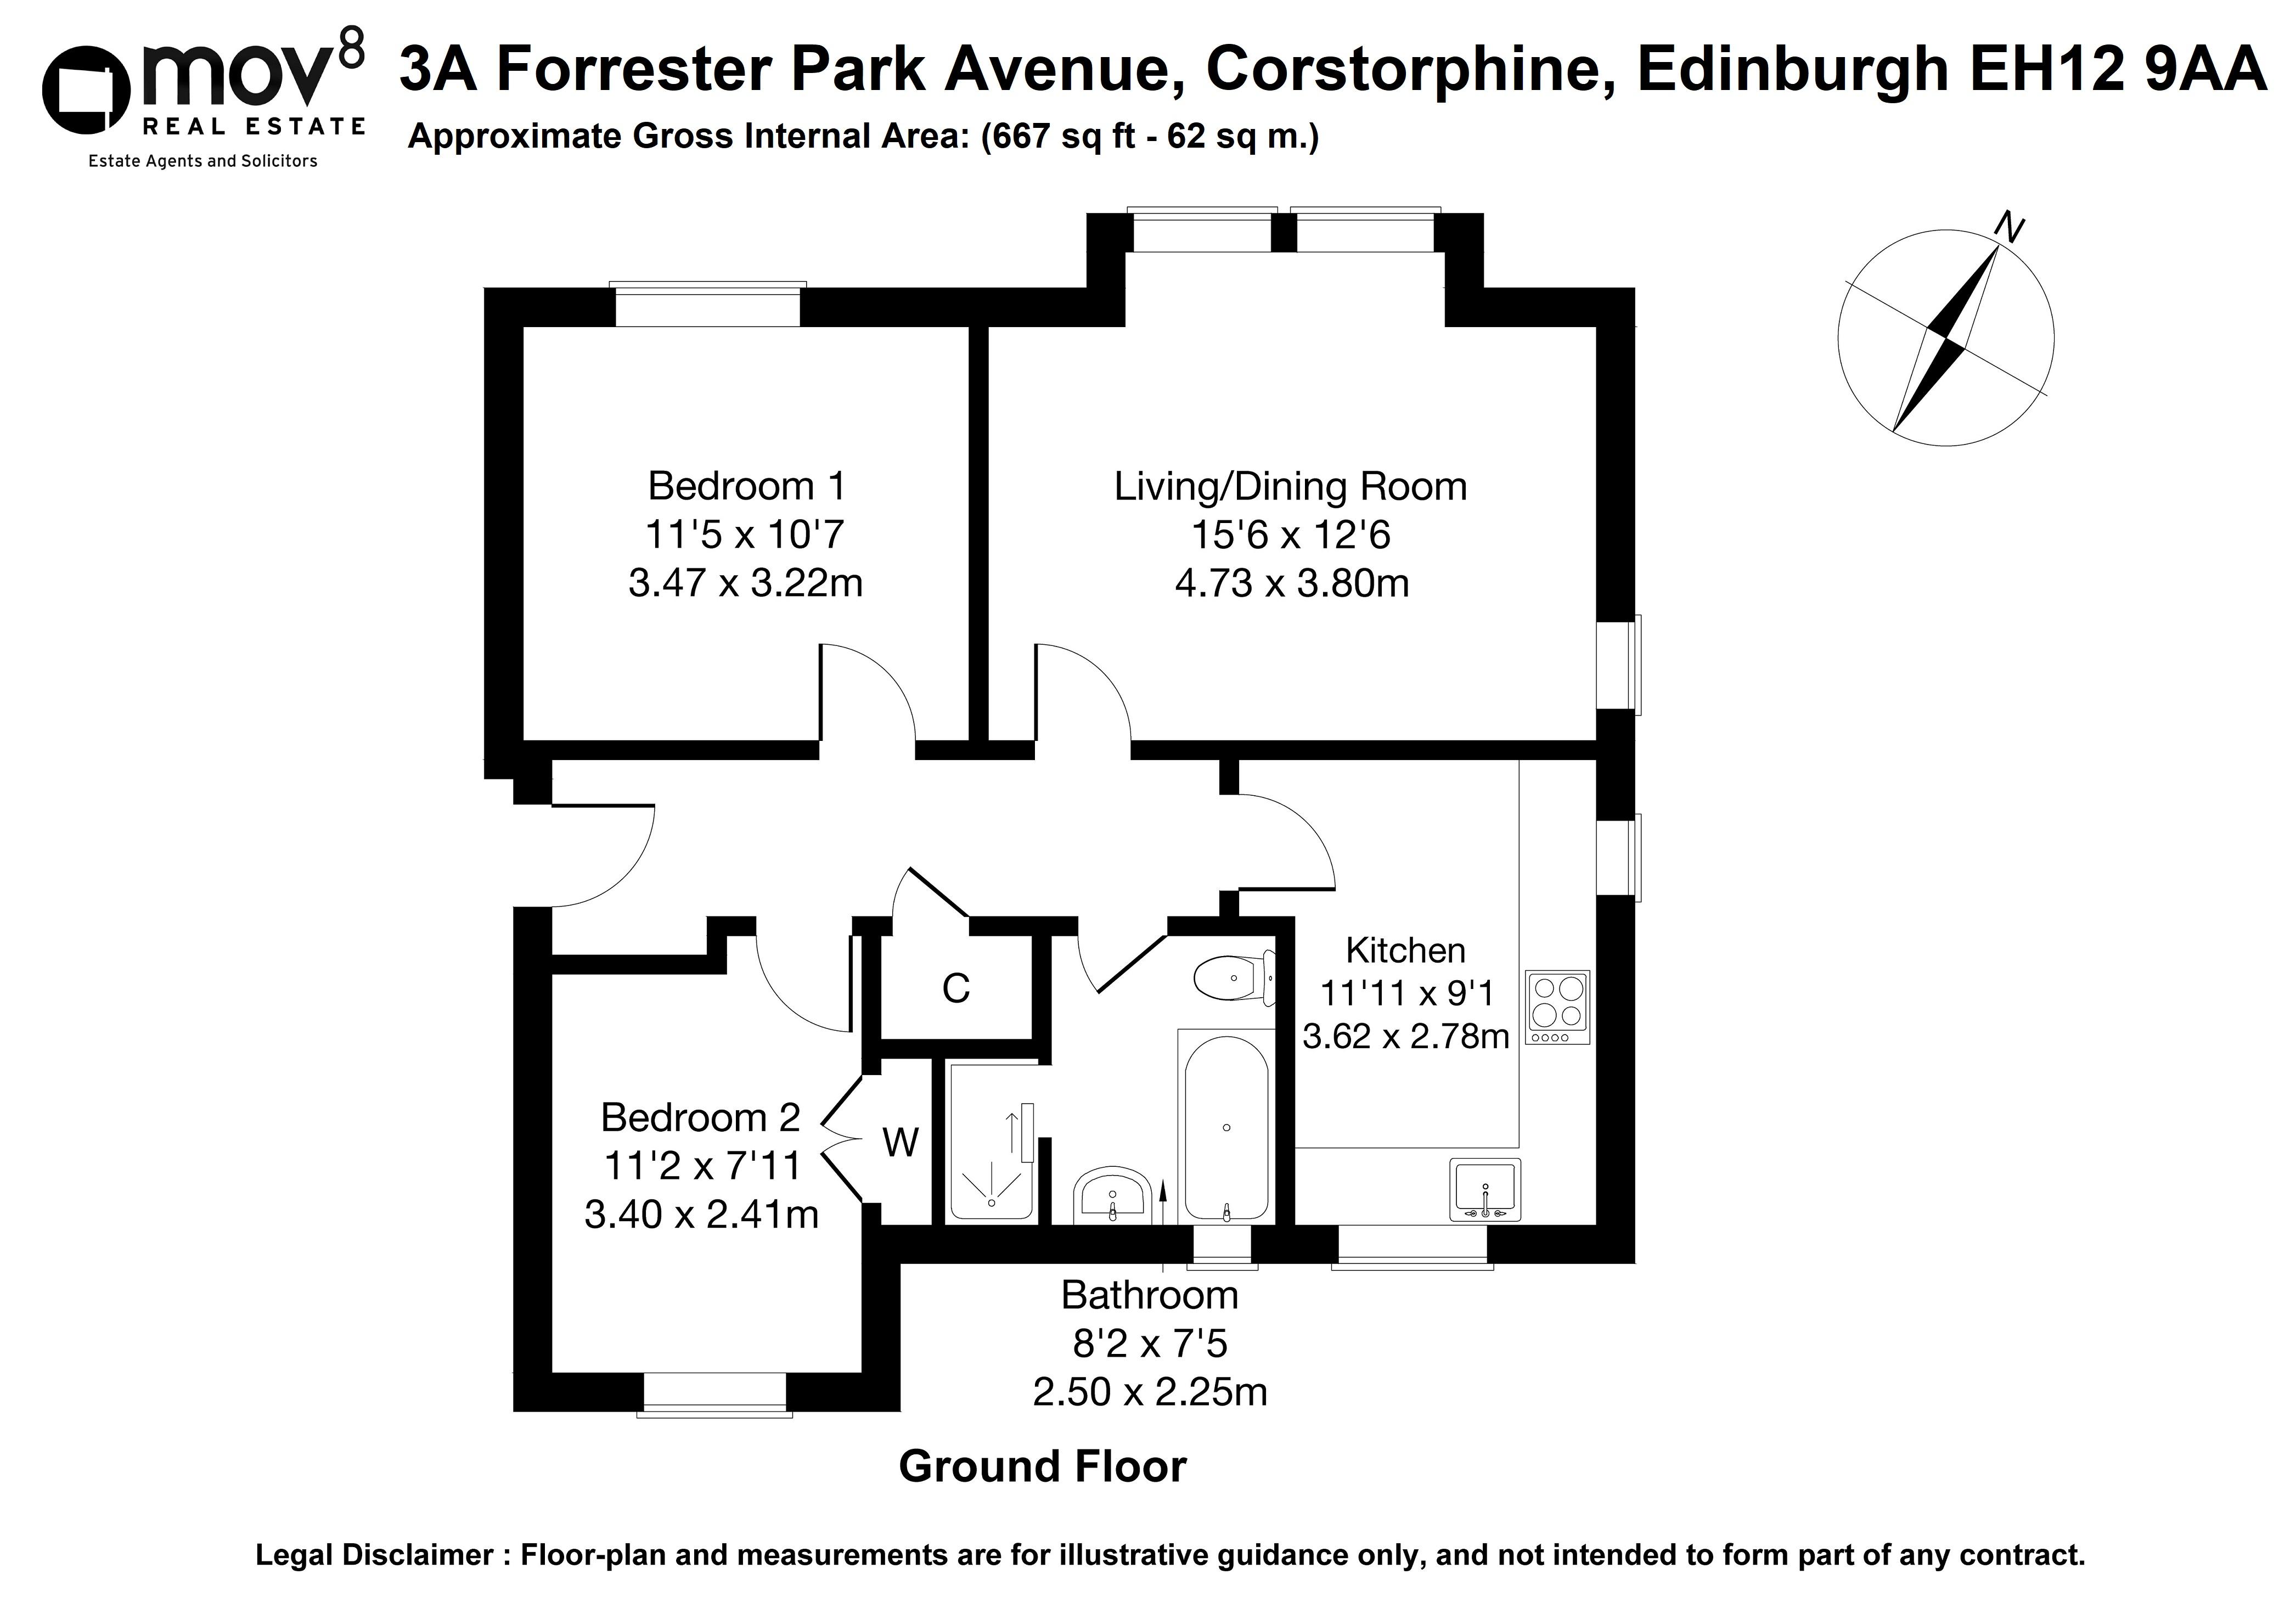 Floorplan 1 of 3a Forrester Park Avenue, Corstorphine, Edinburgh, EH12 9AA